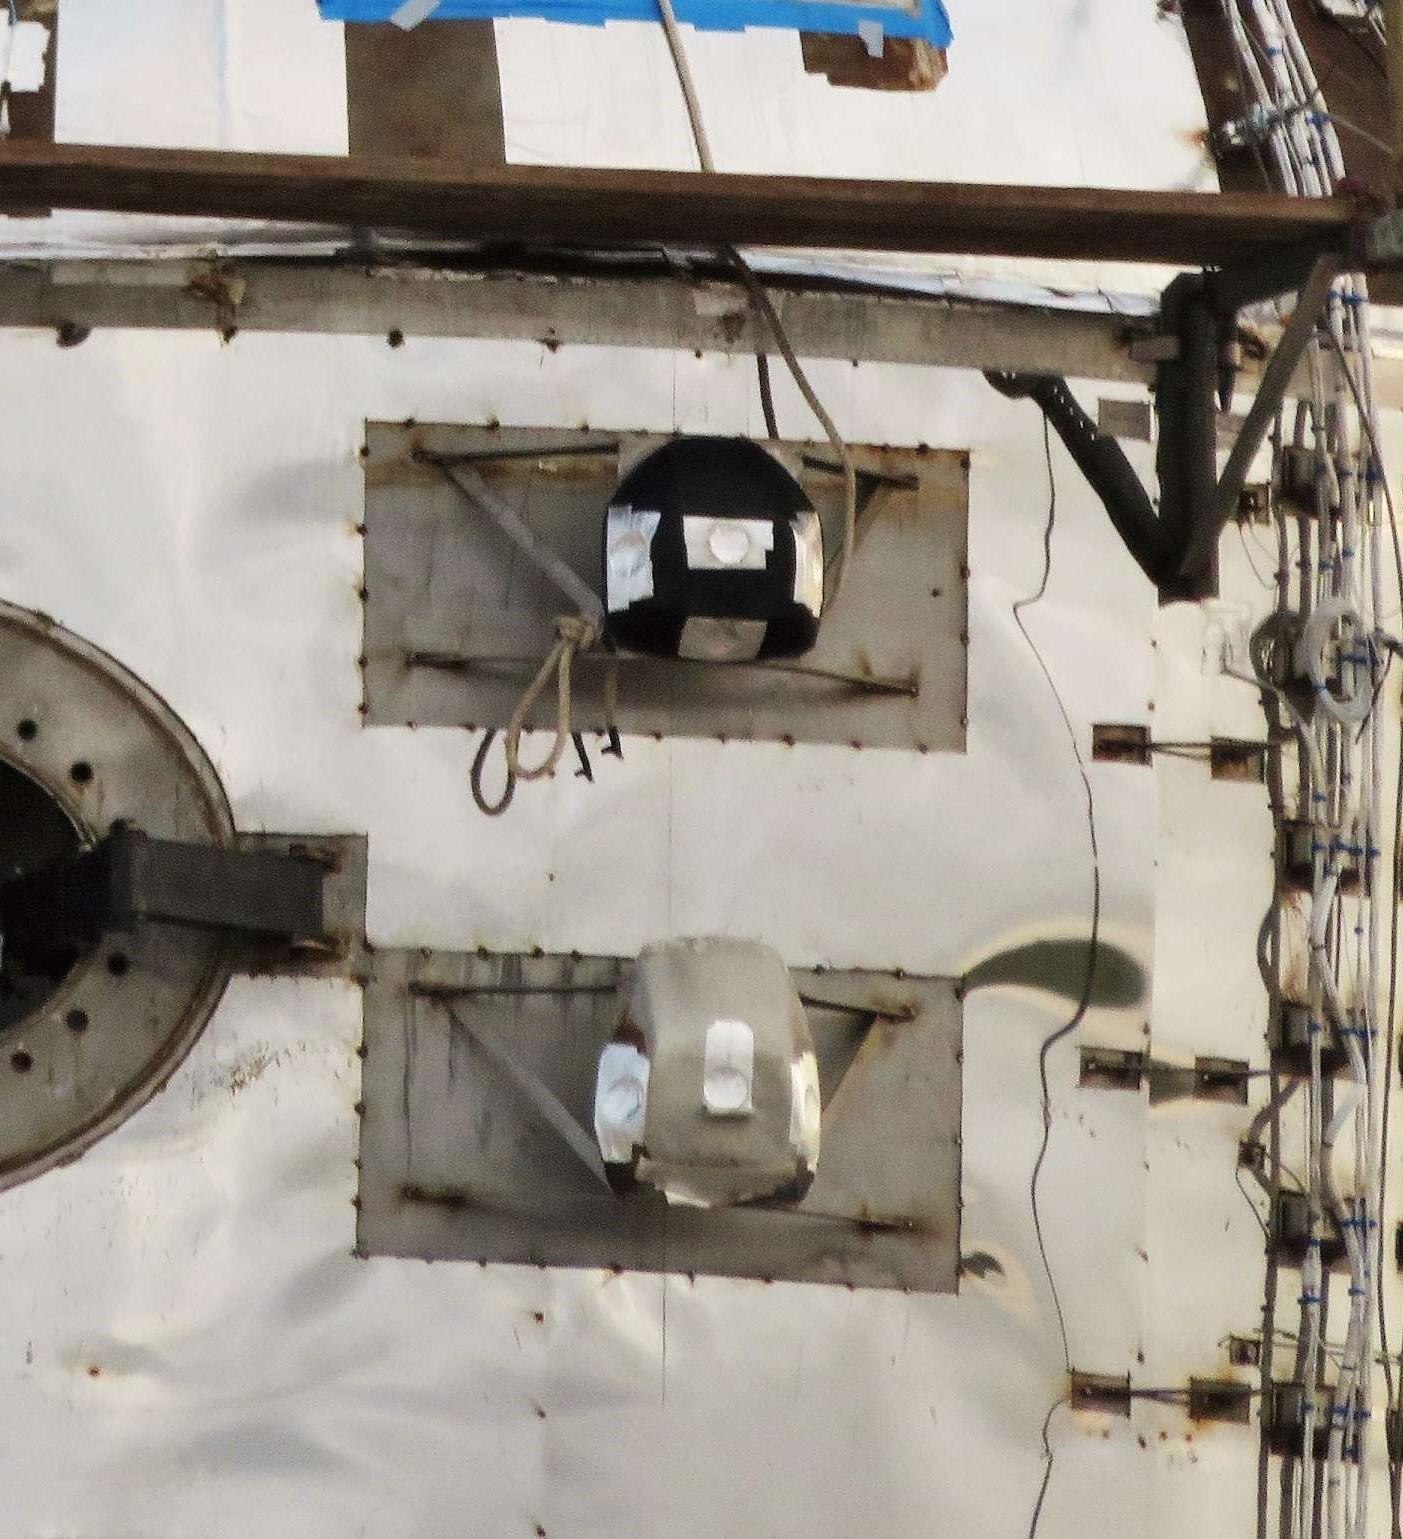 Boca Chica Starhopper ACS install 050719 (NASASpaceflight – bocachicagal) 4 crop (c) 2